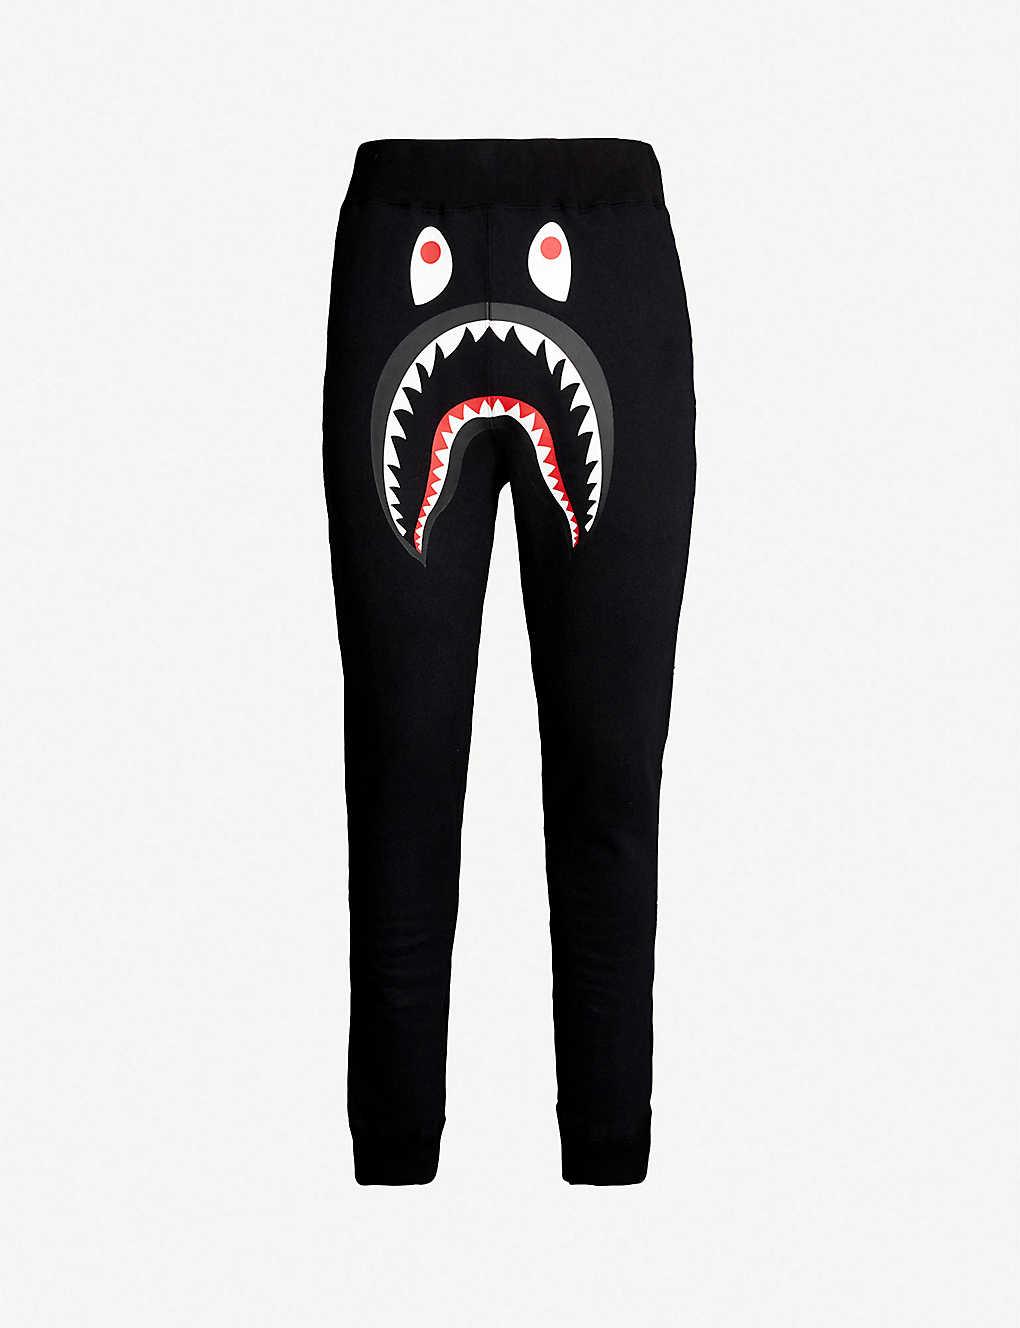 A BATHING APE - Shark-print cotton jogging bottoms  8bbcf0039a